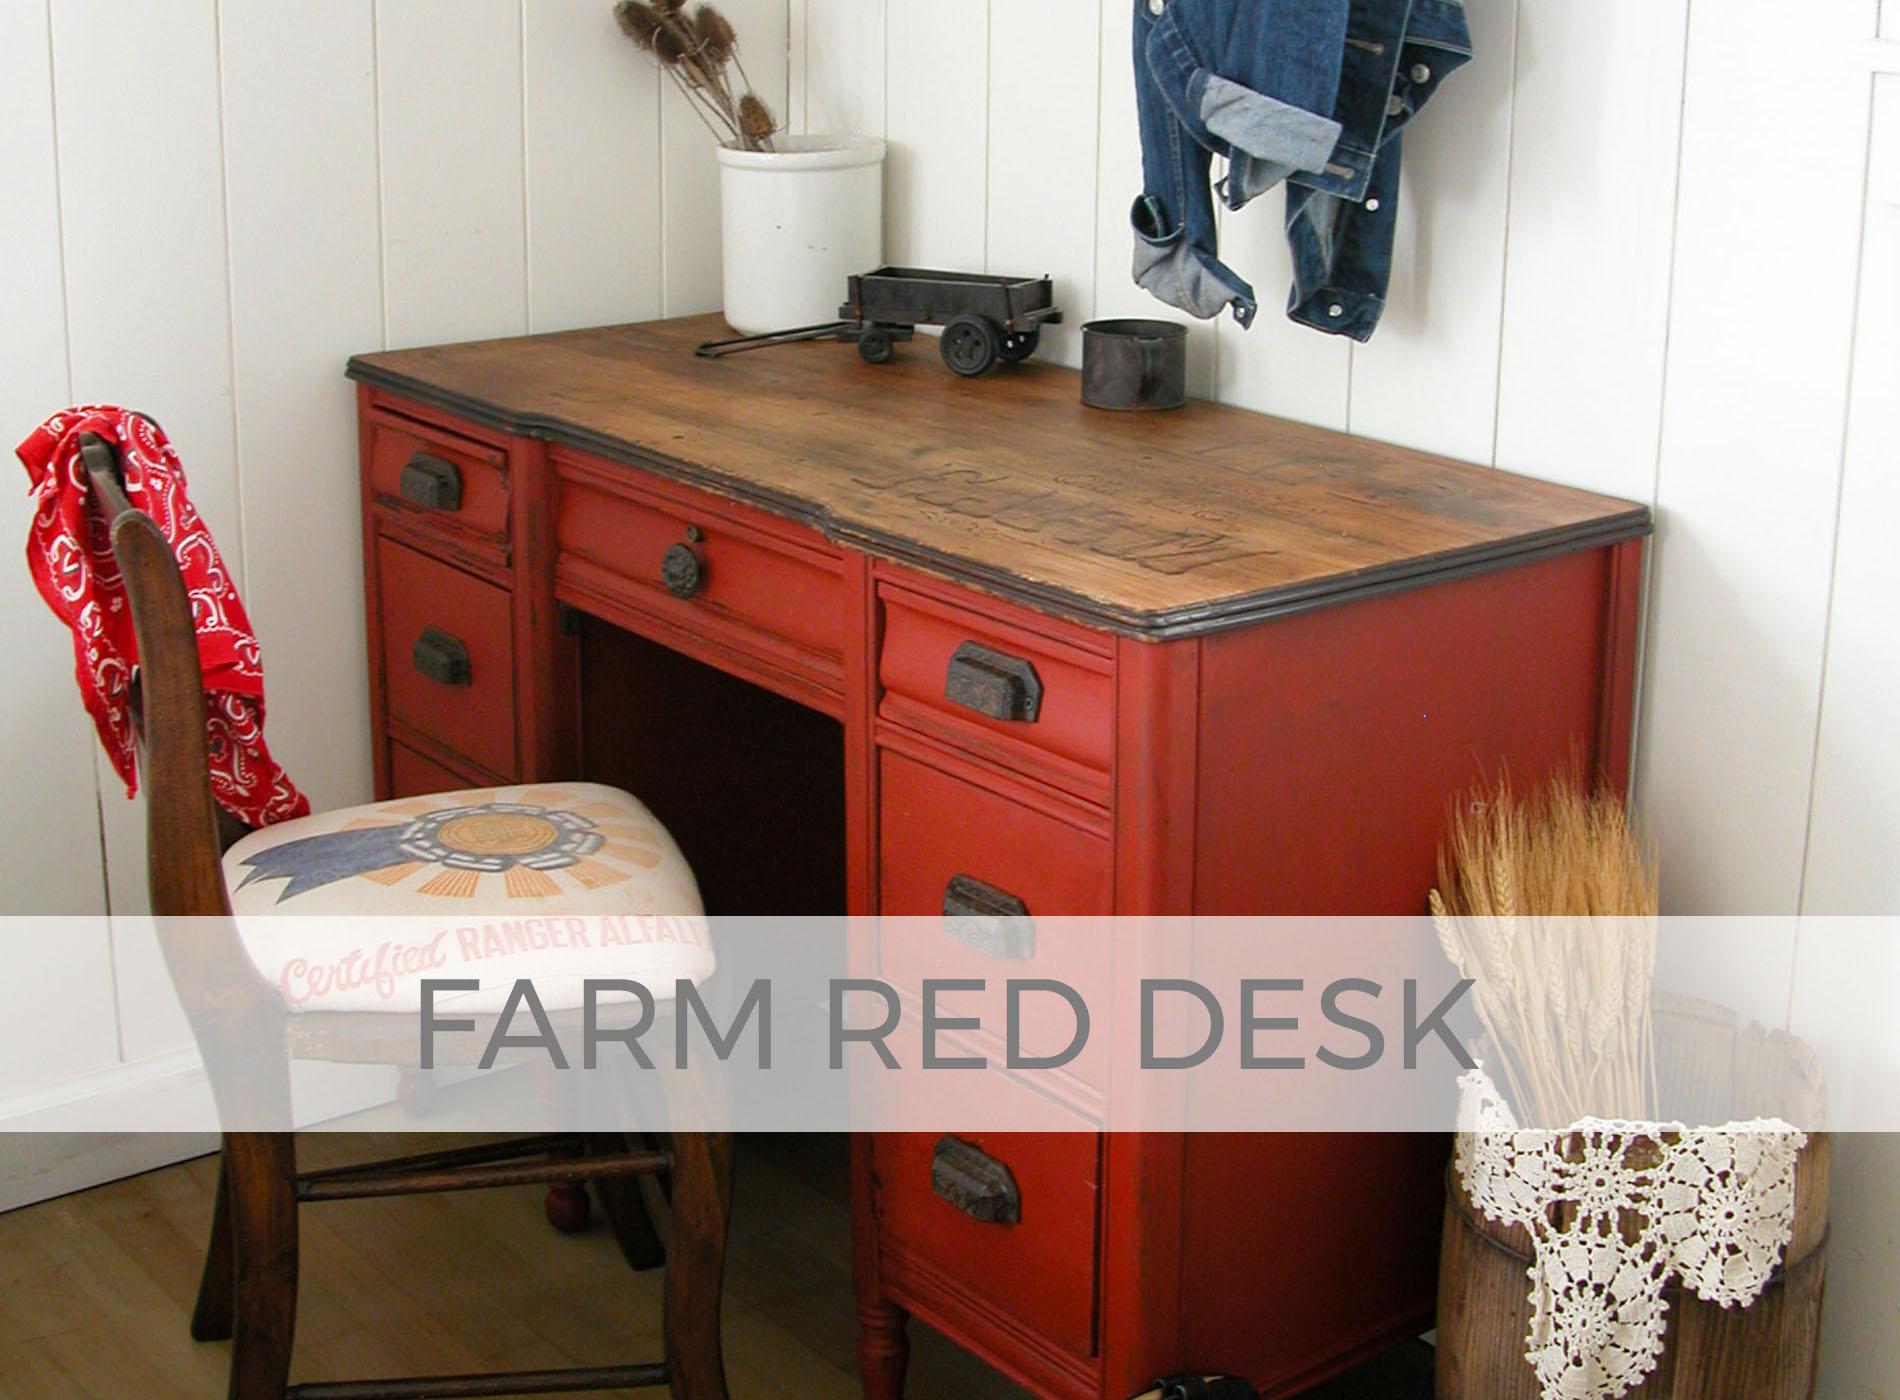 Farm Red Desk by Larissa of Prodigal Pieces | prodigalpieces.com